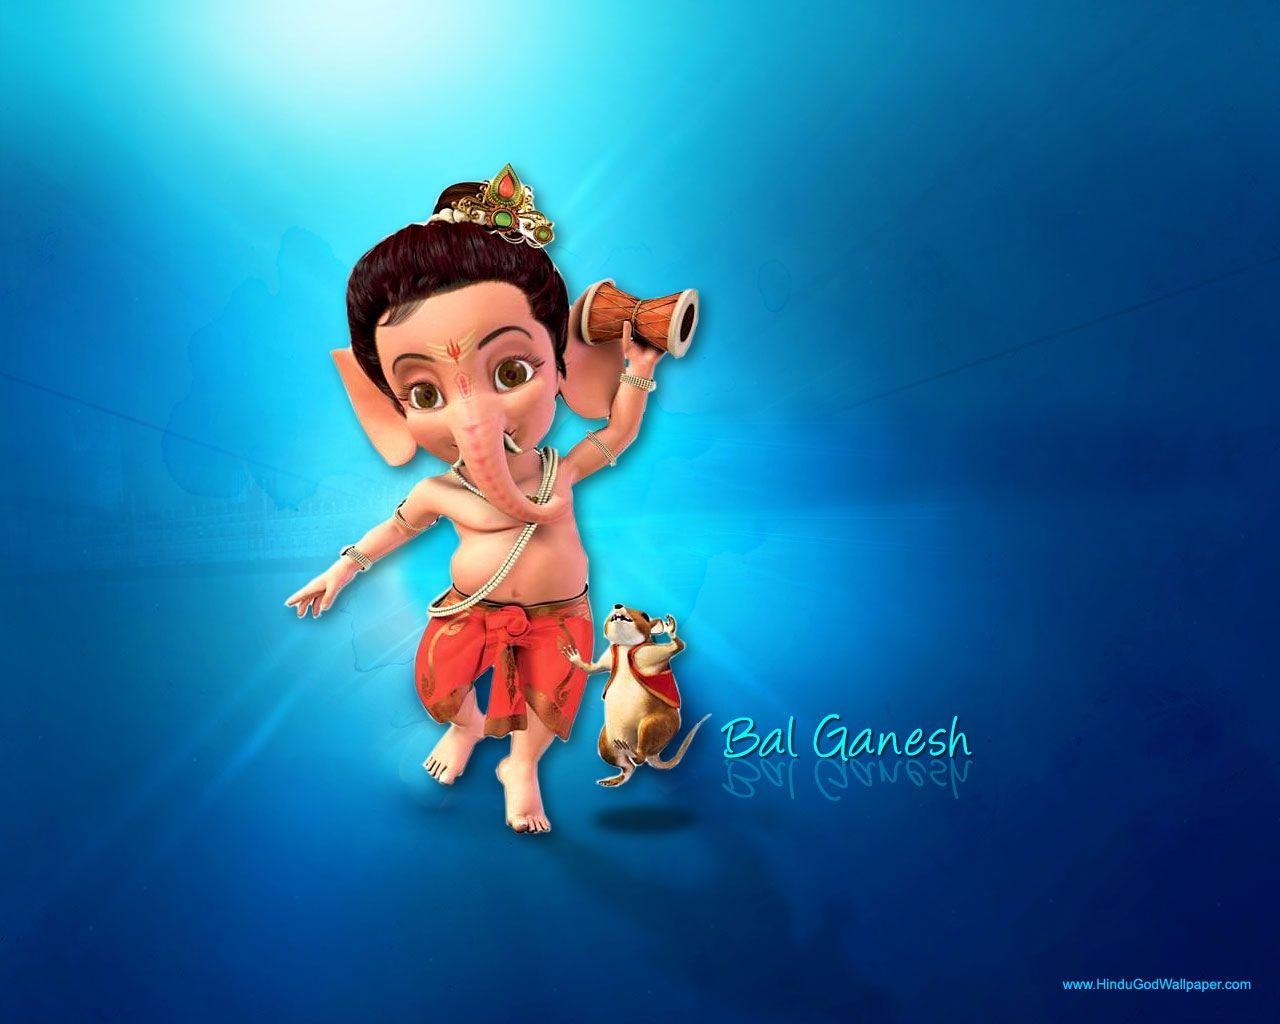 Ganesh Images Full Hd For Desktop